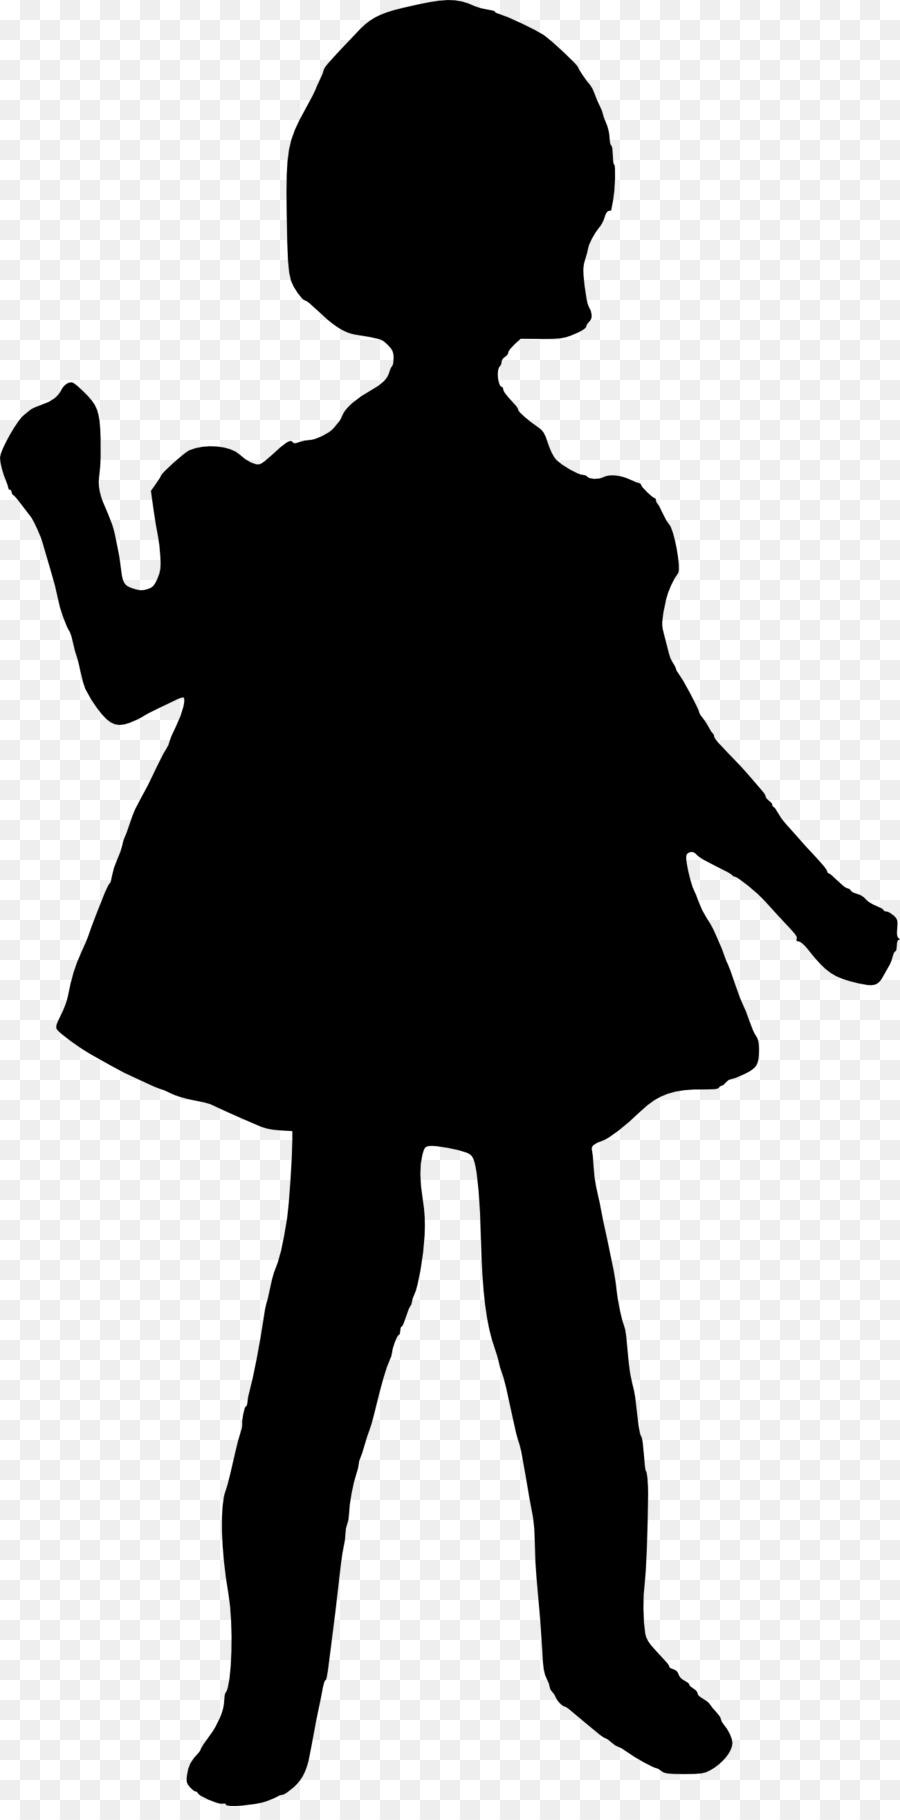 900x1820 Silhouette Girl Clip Art